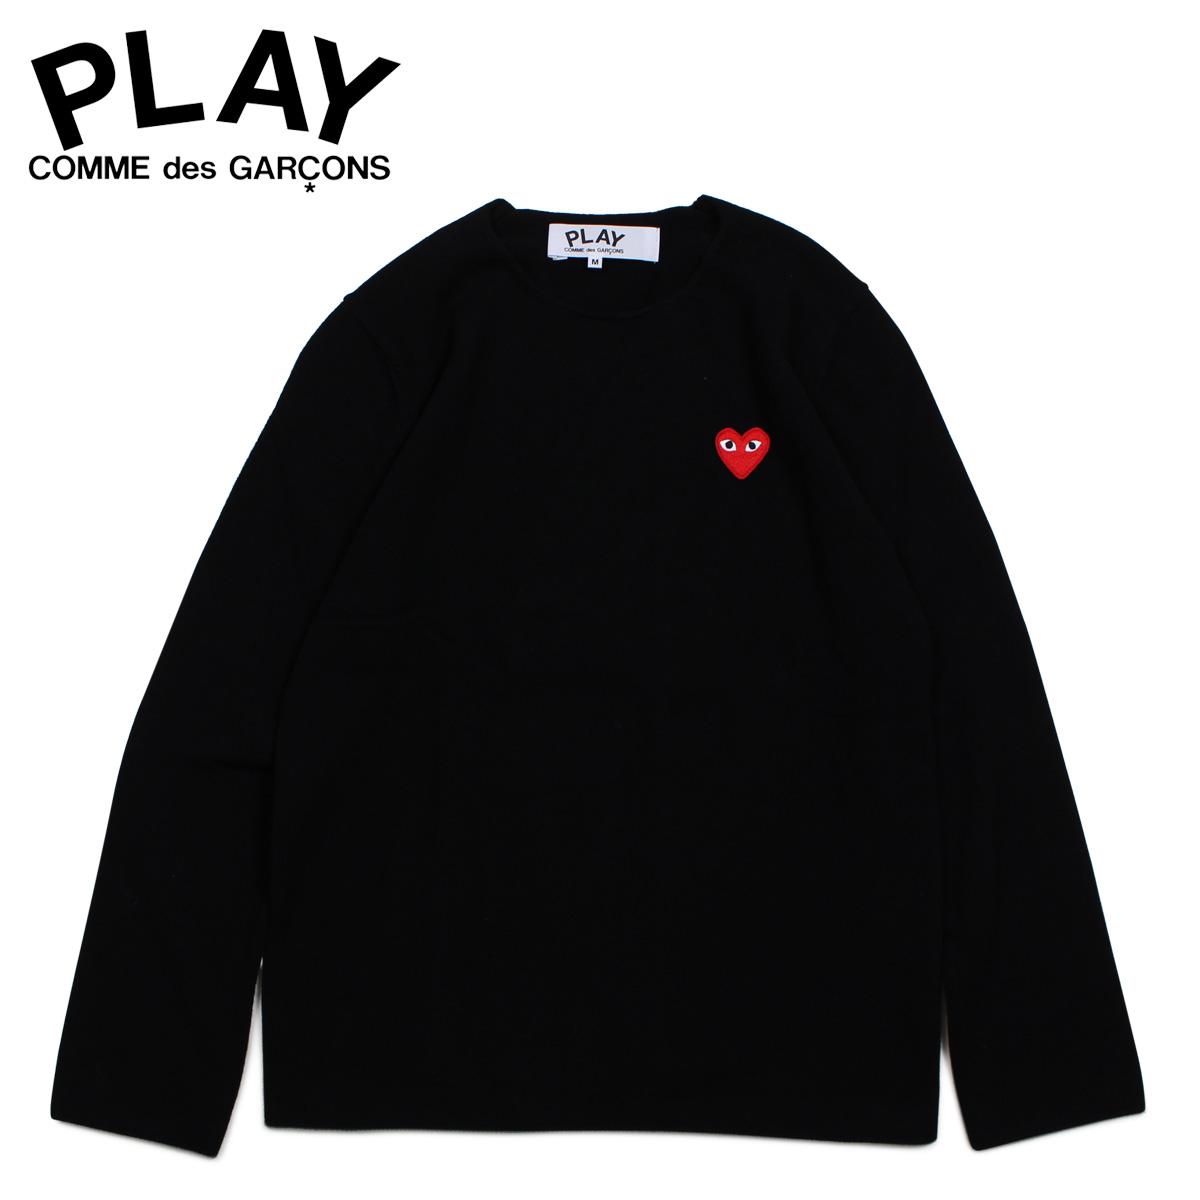 PLAY COMME des GARCONS コムデギャルソン ニット セーター メンズ RED HEART CREW NECK SWEATER ブラック 黒 AZ-N068 [4/1 新入荷]